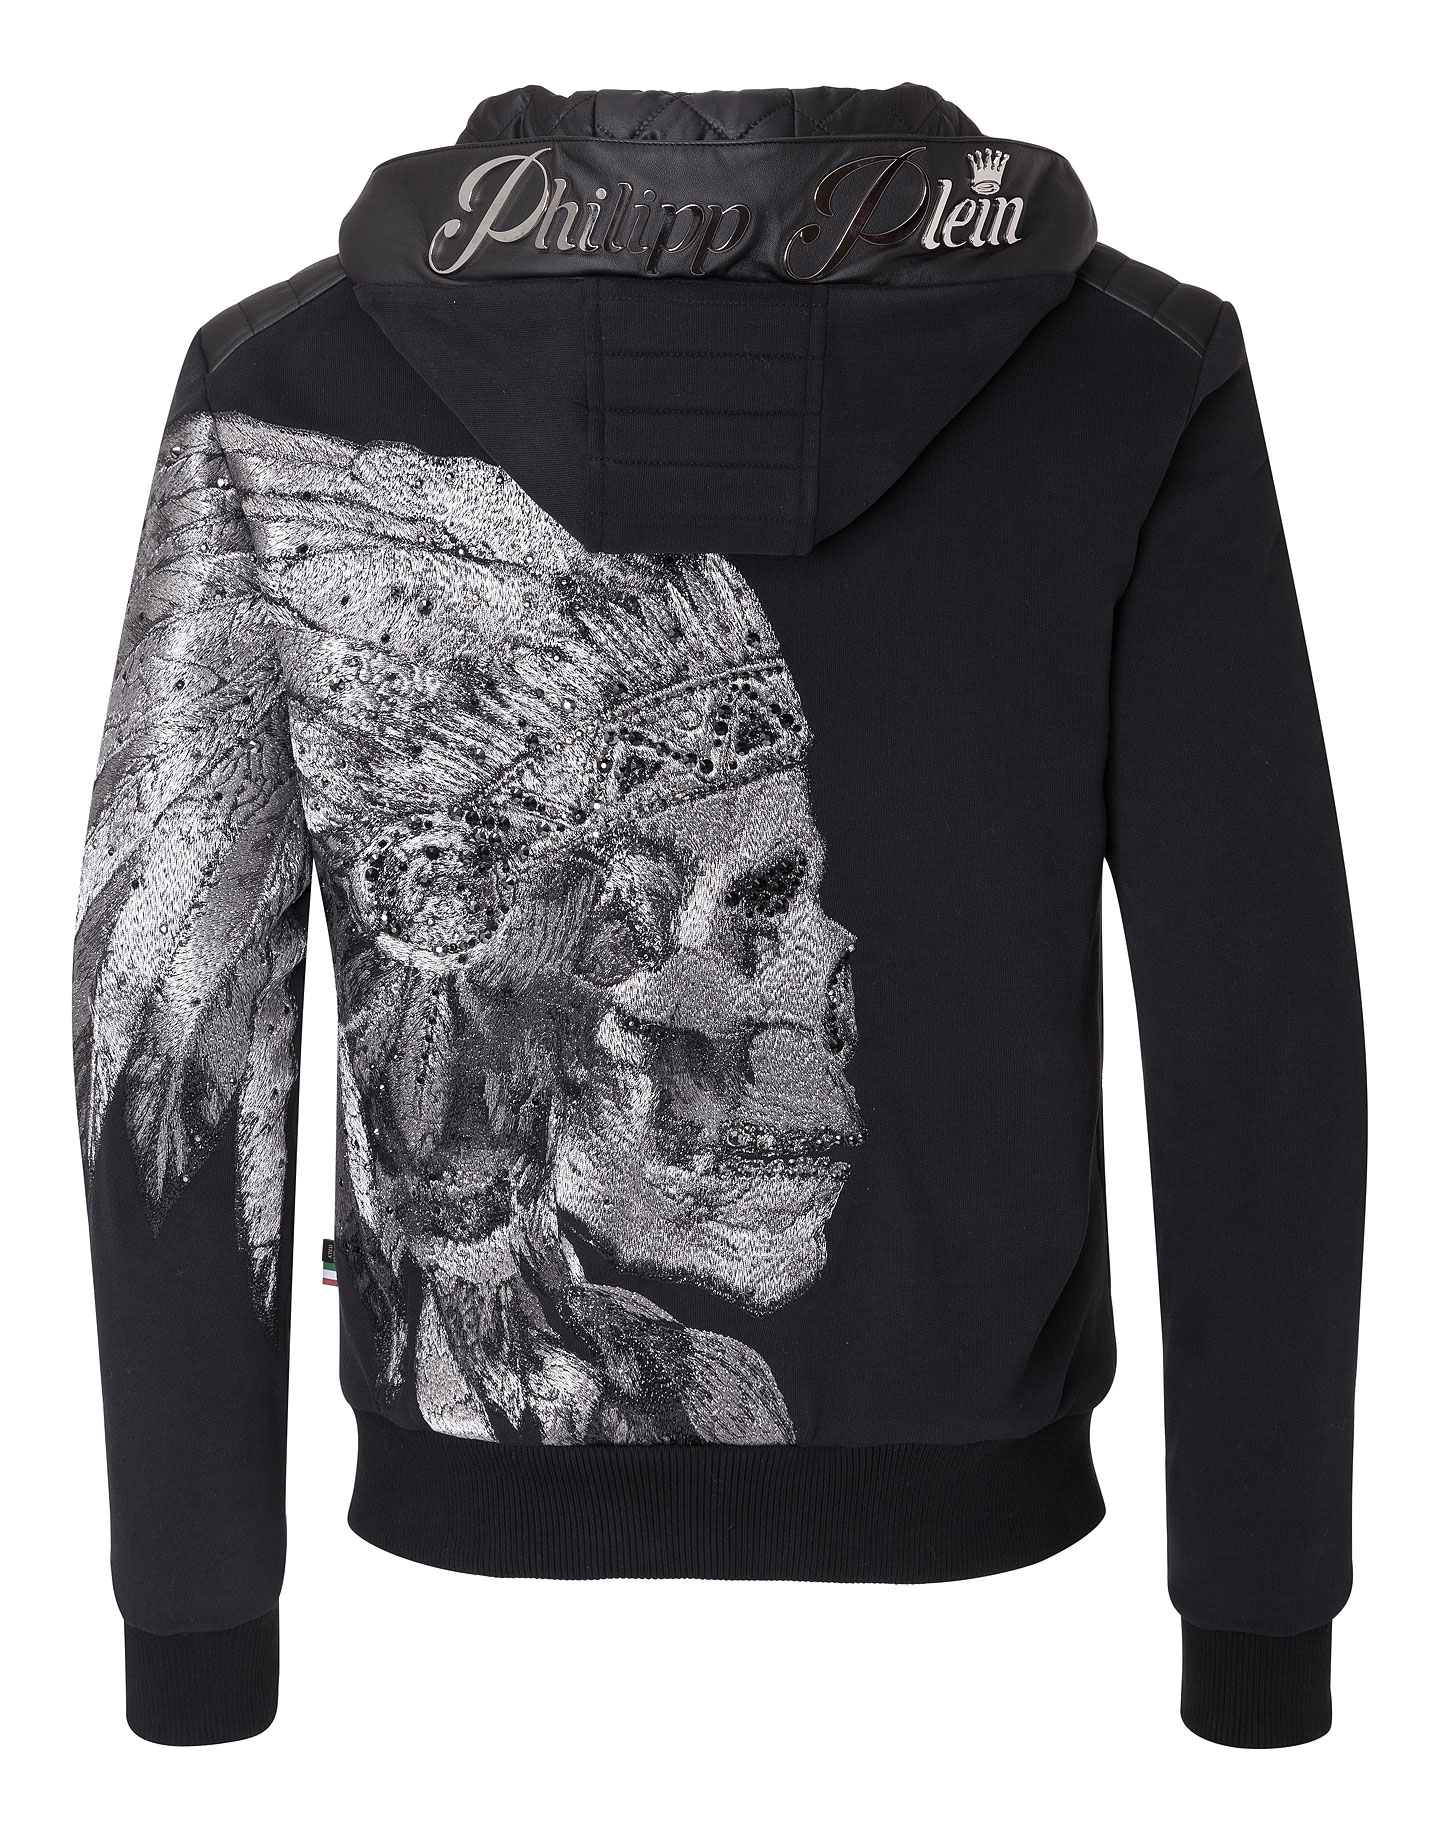 0f5487c1ed08fa Hoodie sweatshirt